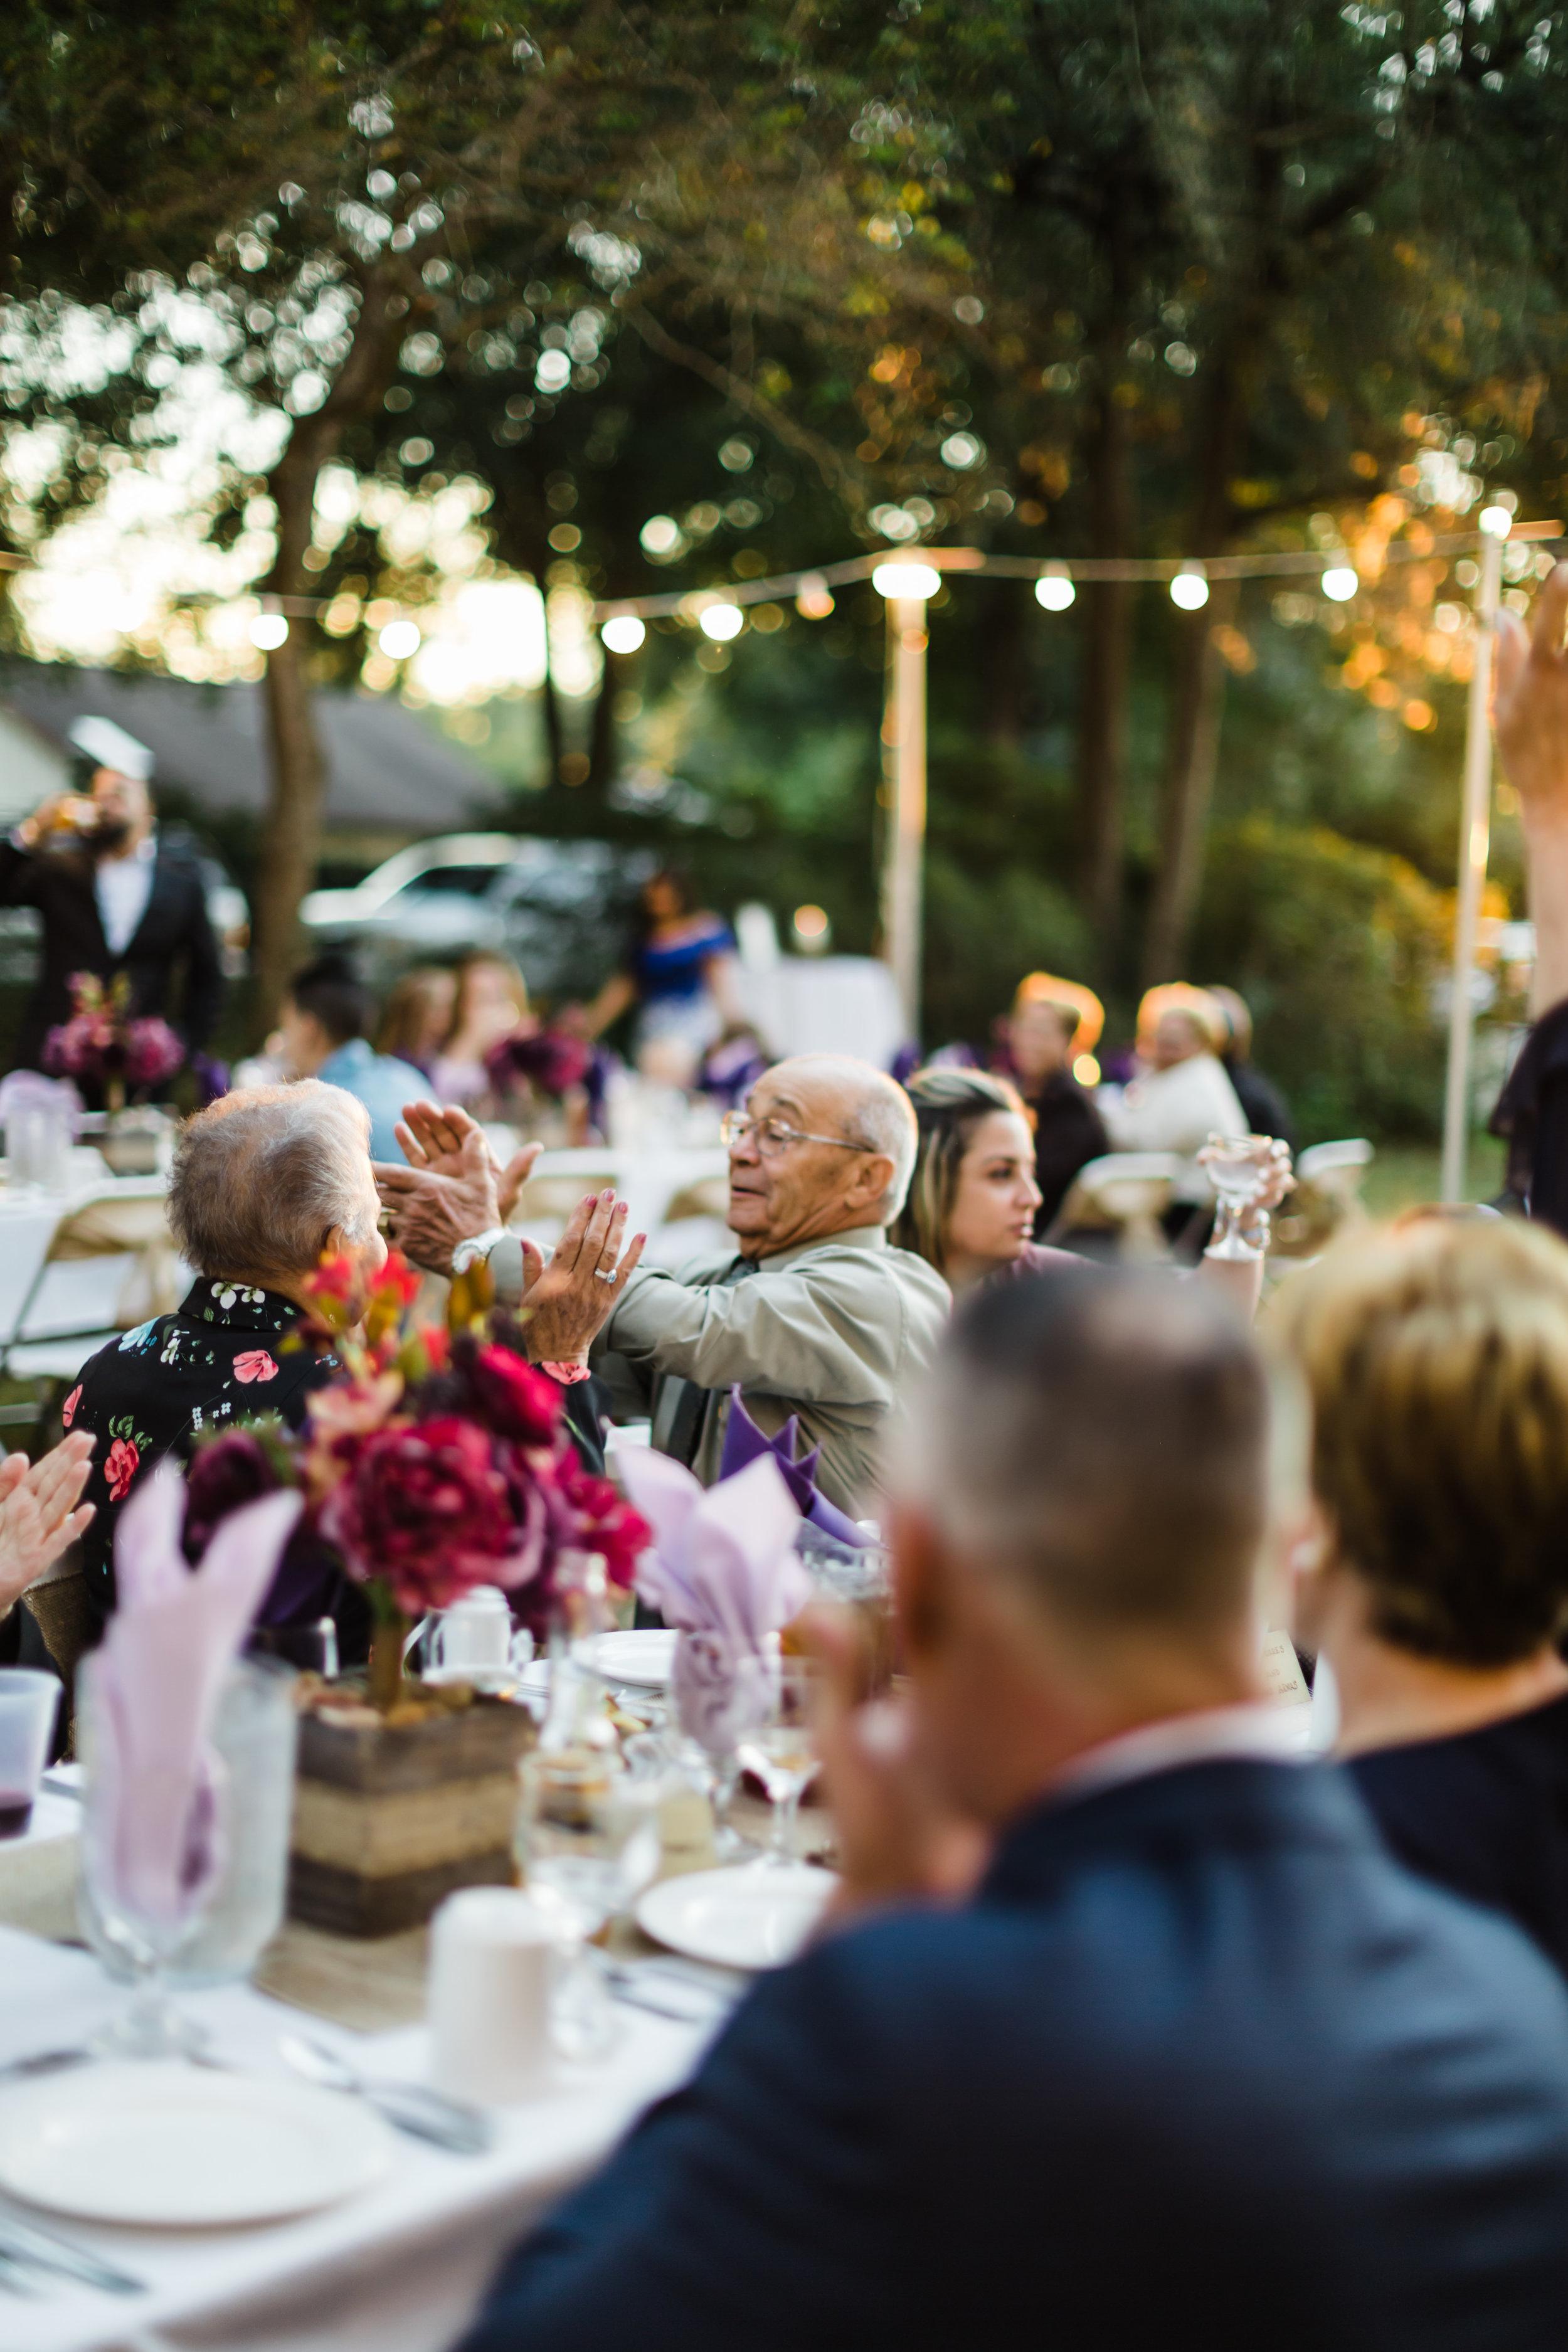 2018.11.03 Jael and Edel Ocala Wedding FINALS (361 of 441).jpg